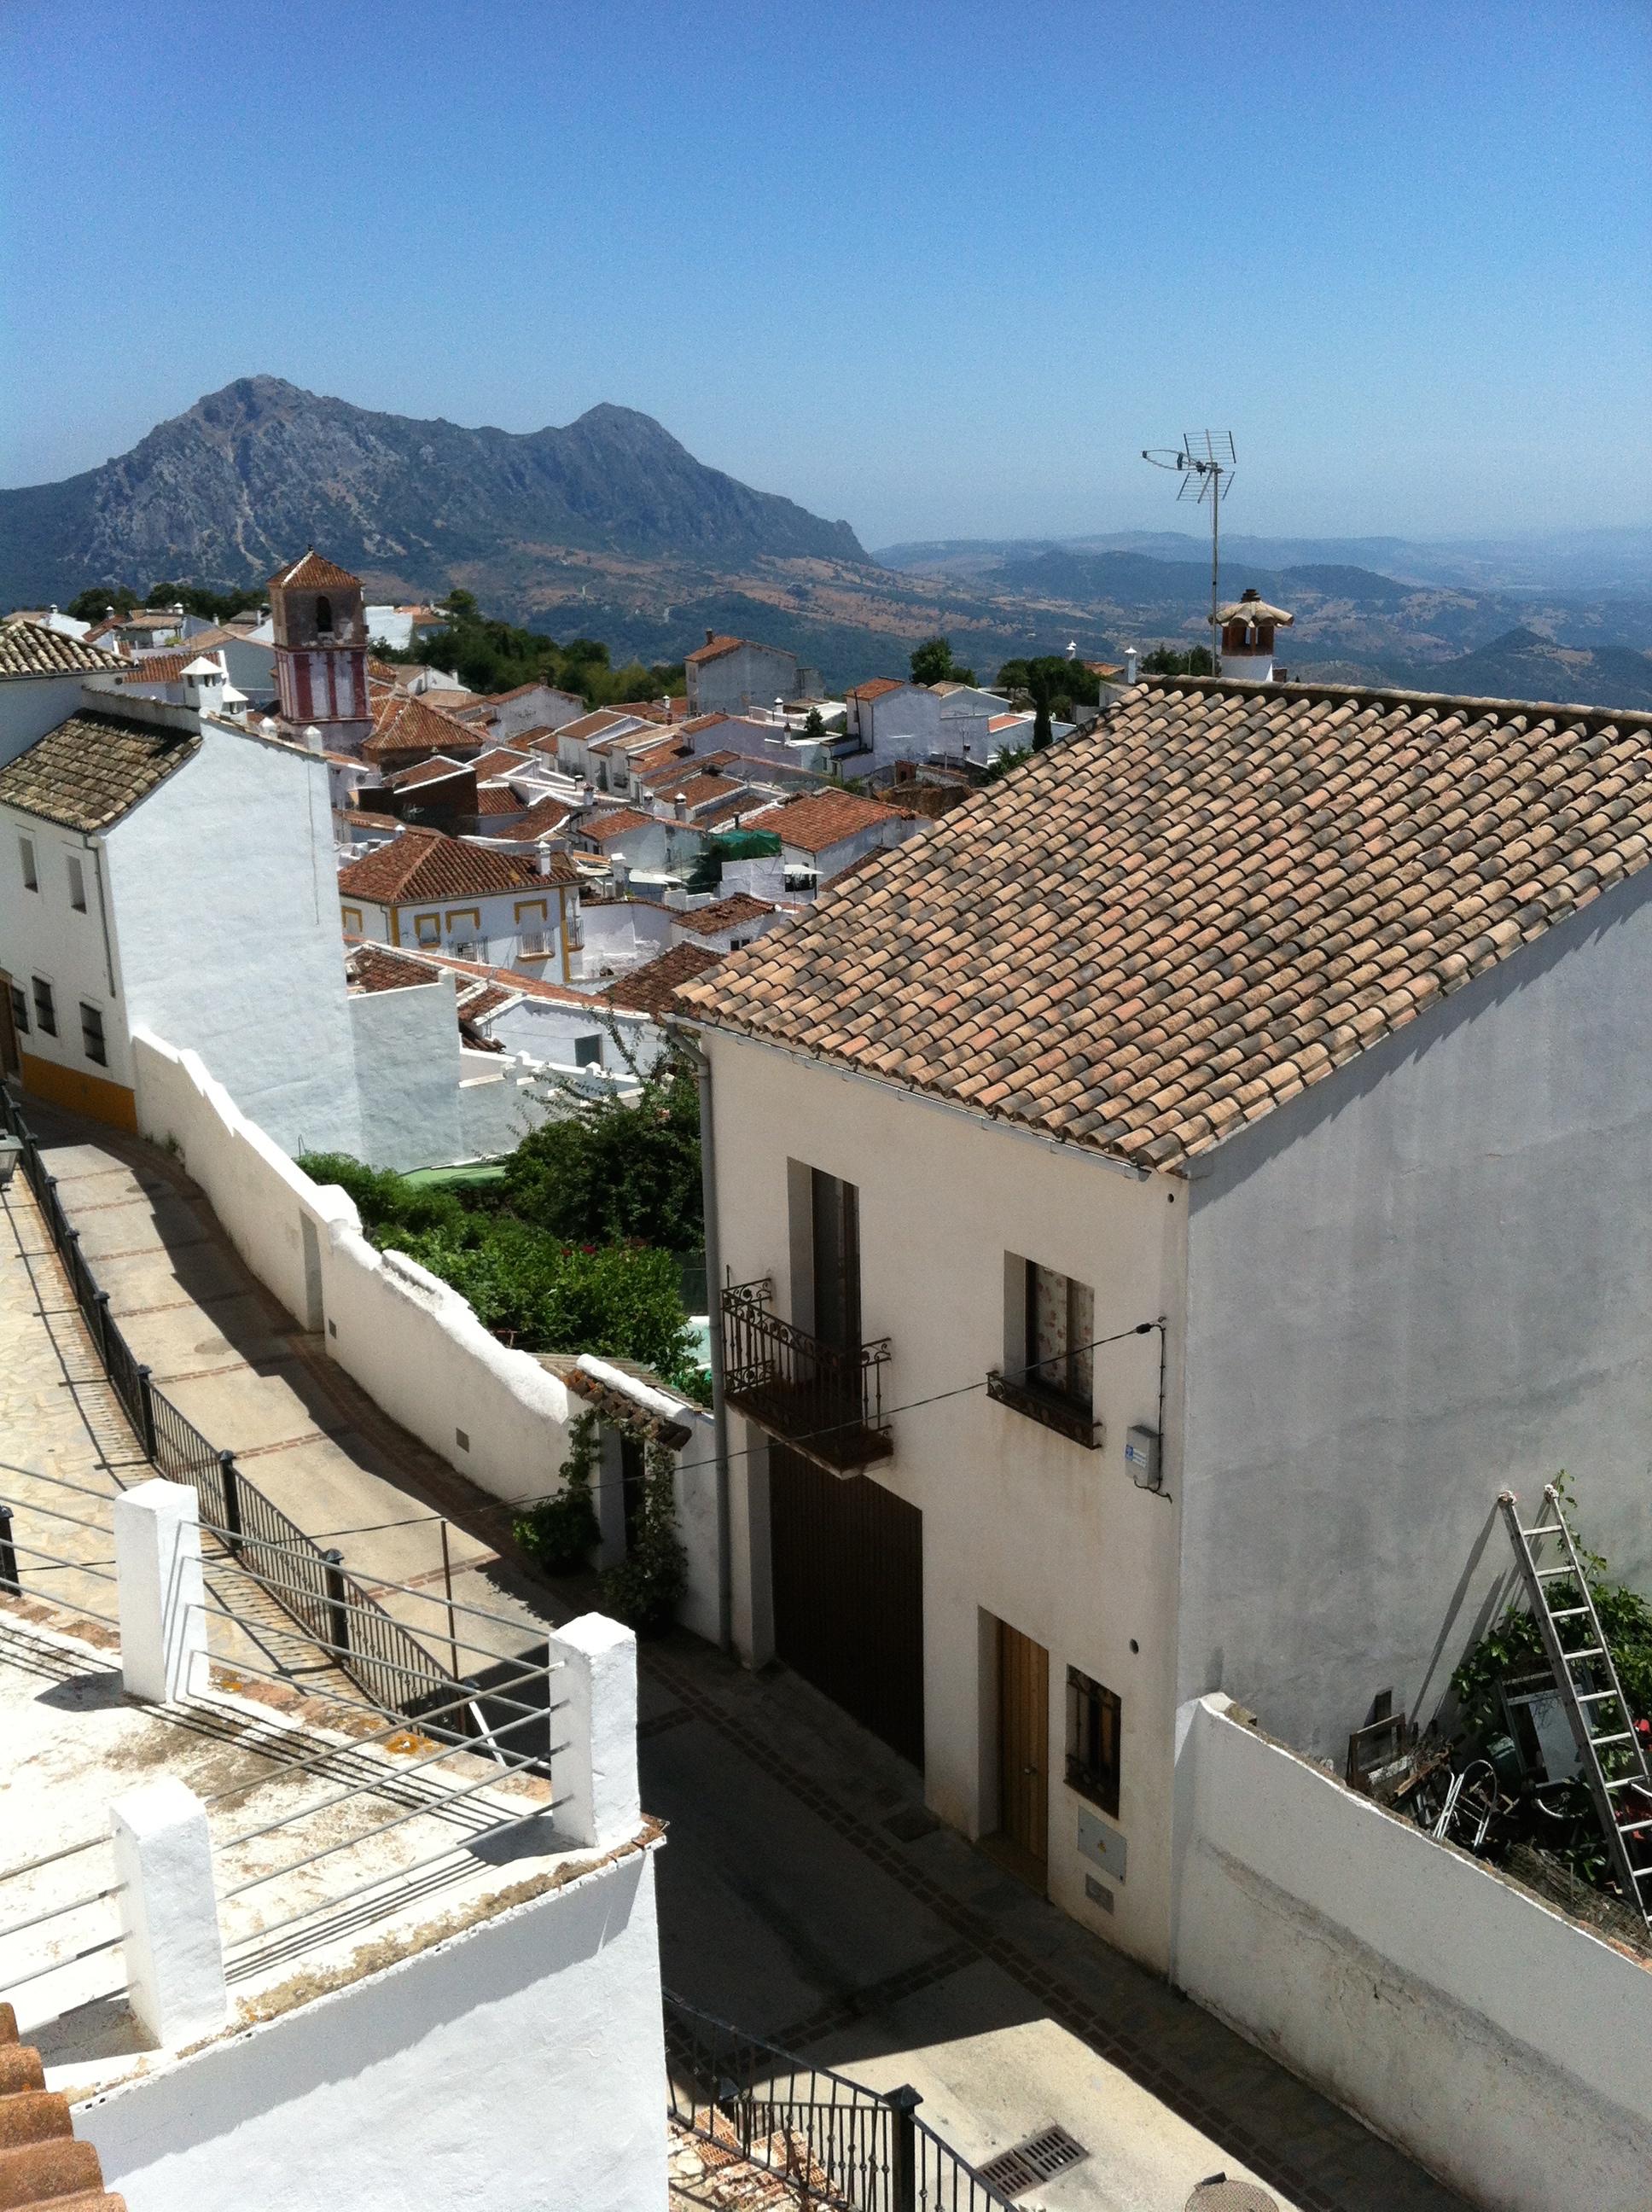 Views in Gaucin